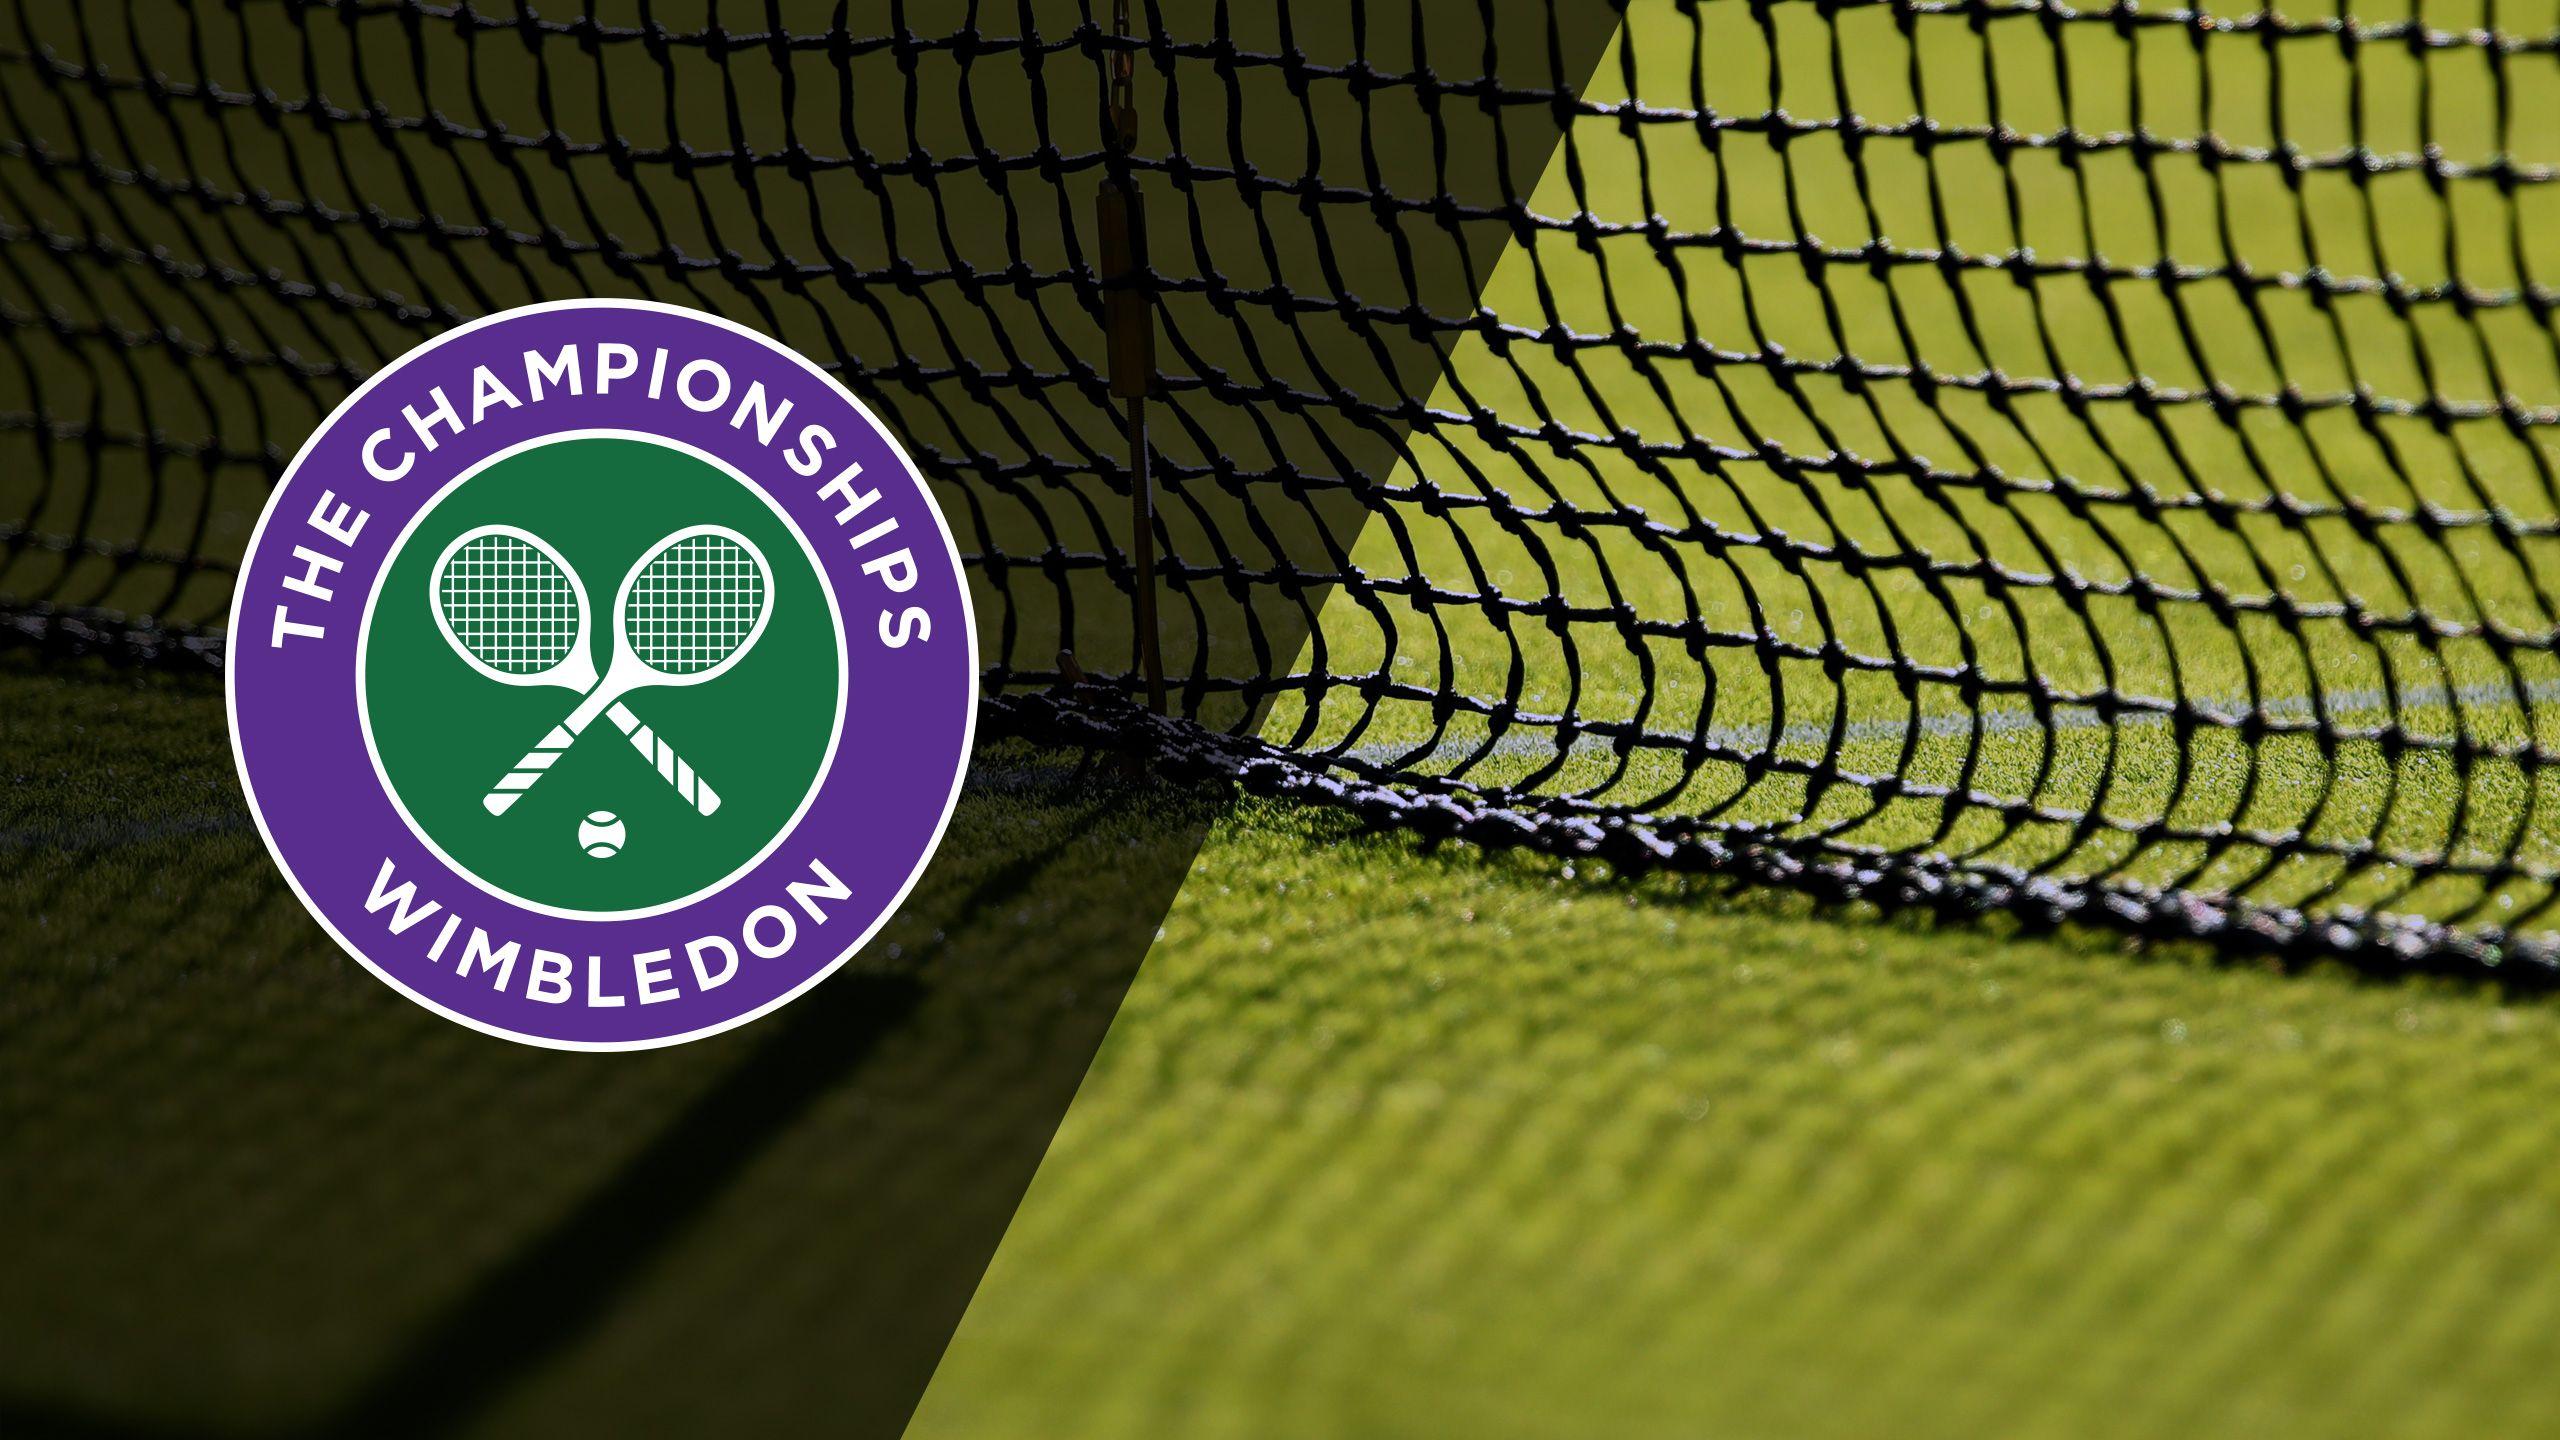 The Championships, Wimbledon 2018 (Gentlemen's Championship)